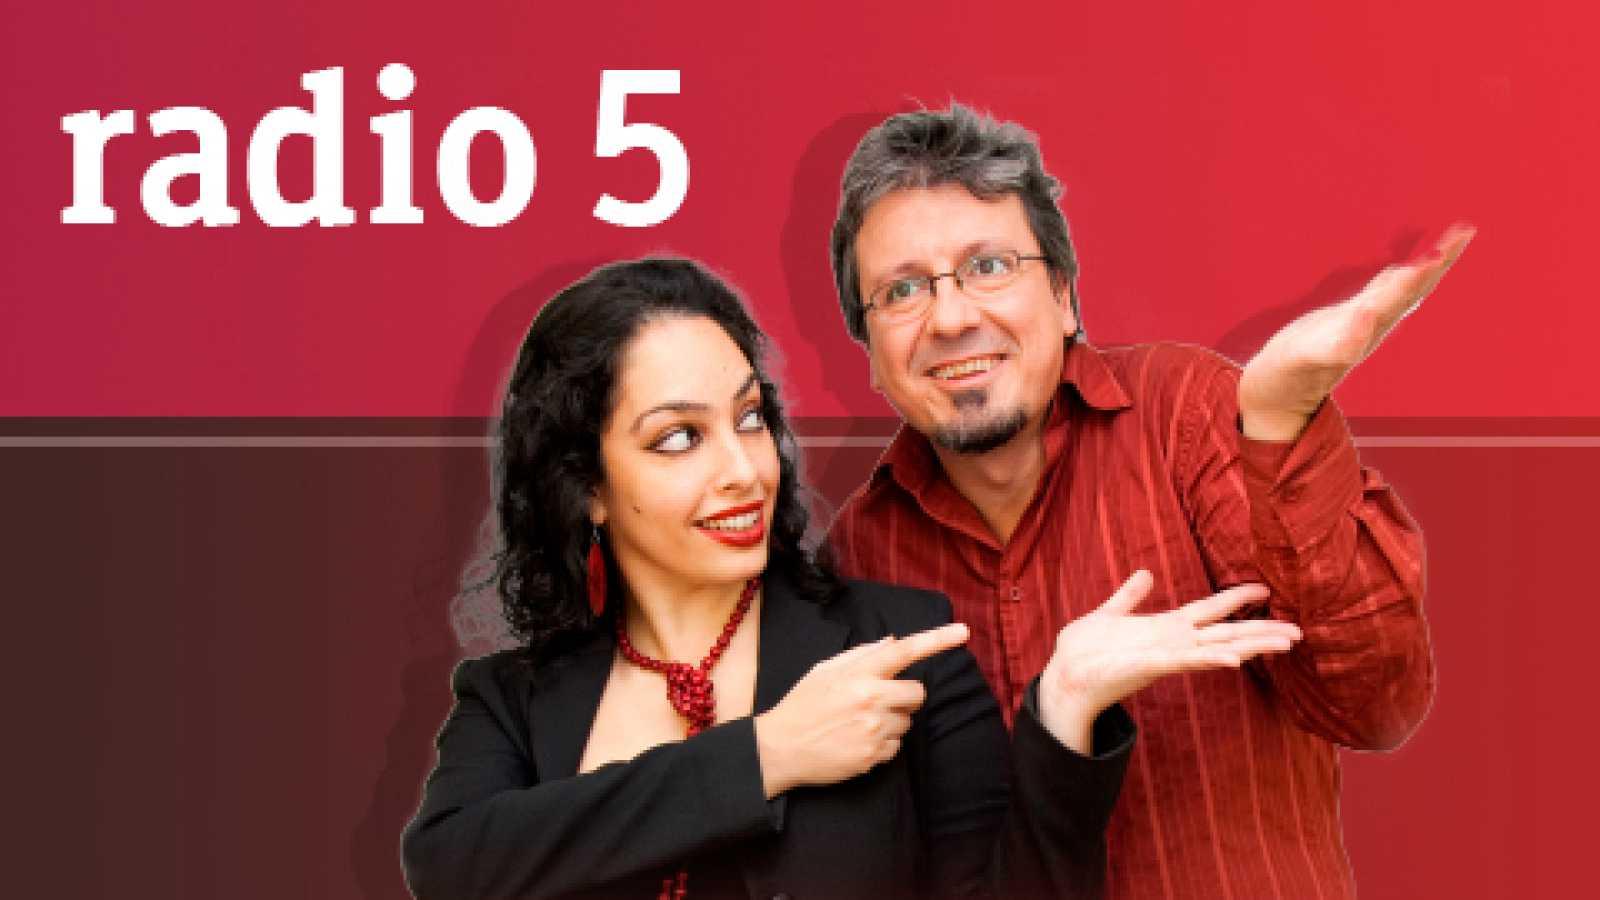 En concierto - Festival Jazz Cádiz - 27/07/16 - Escuchar ahora